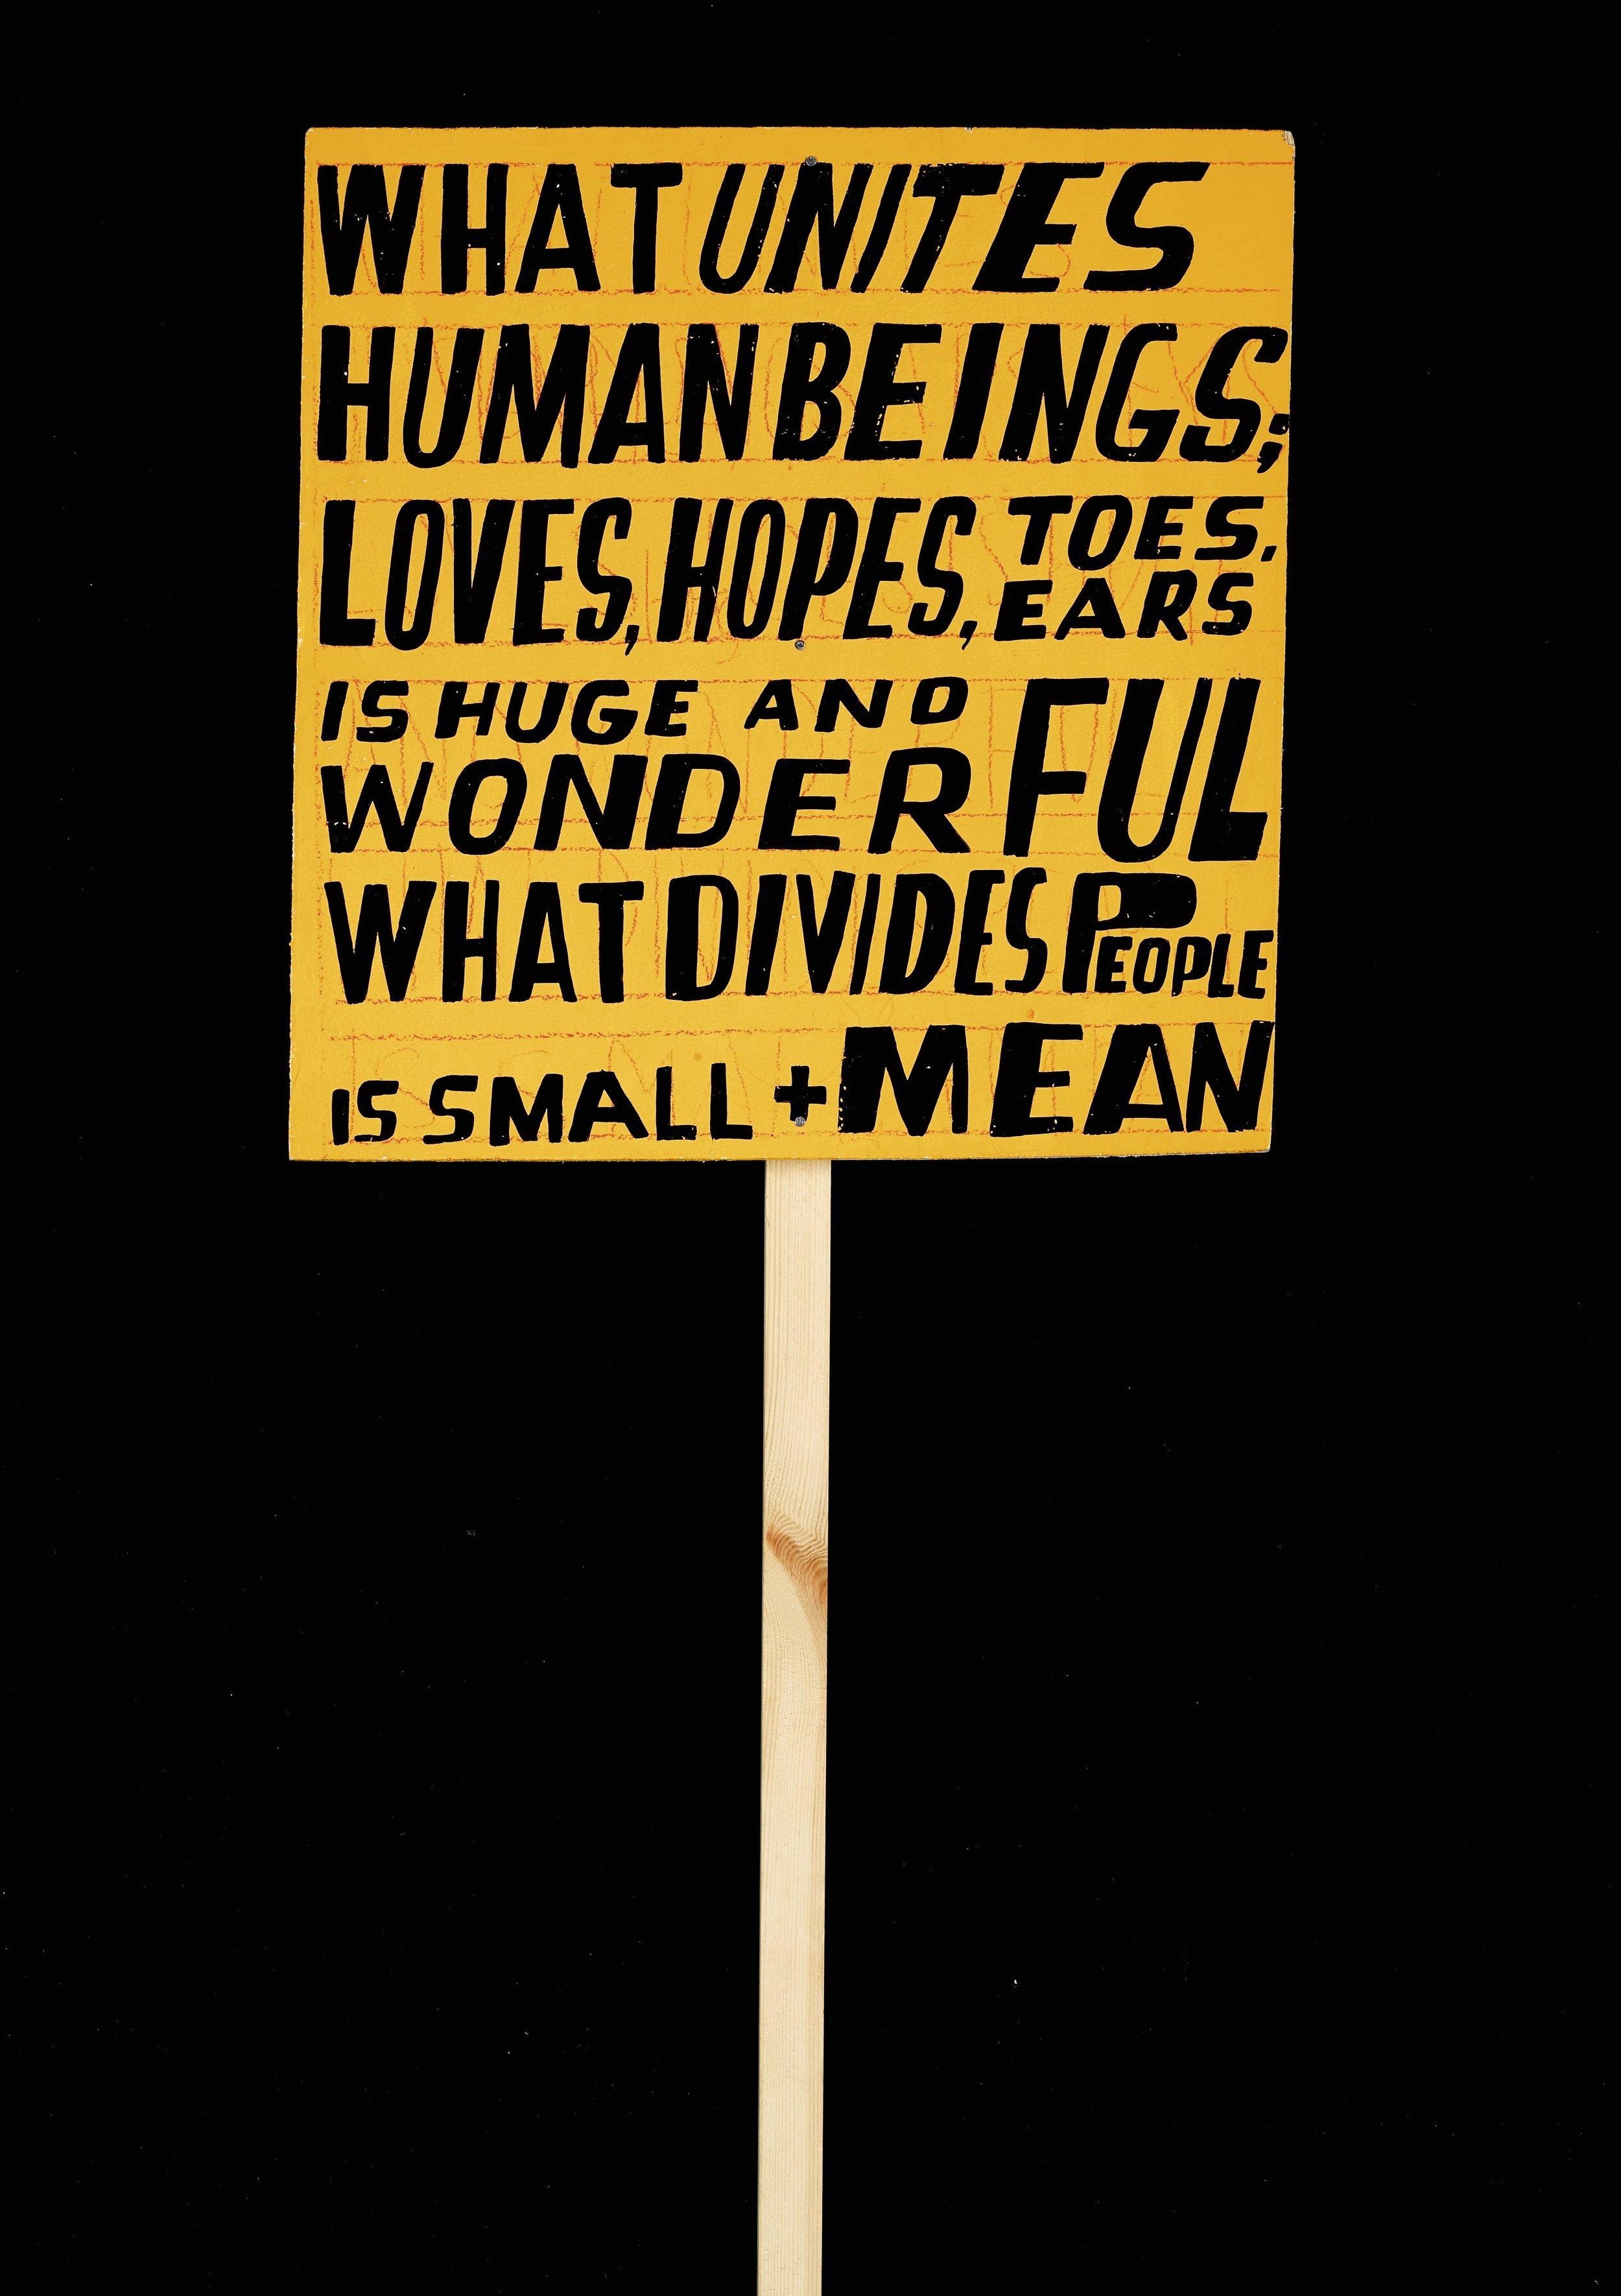 Lot 1: Bob & Roberta Smith - What Unites Human Beings